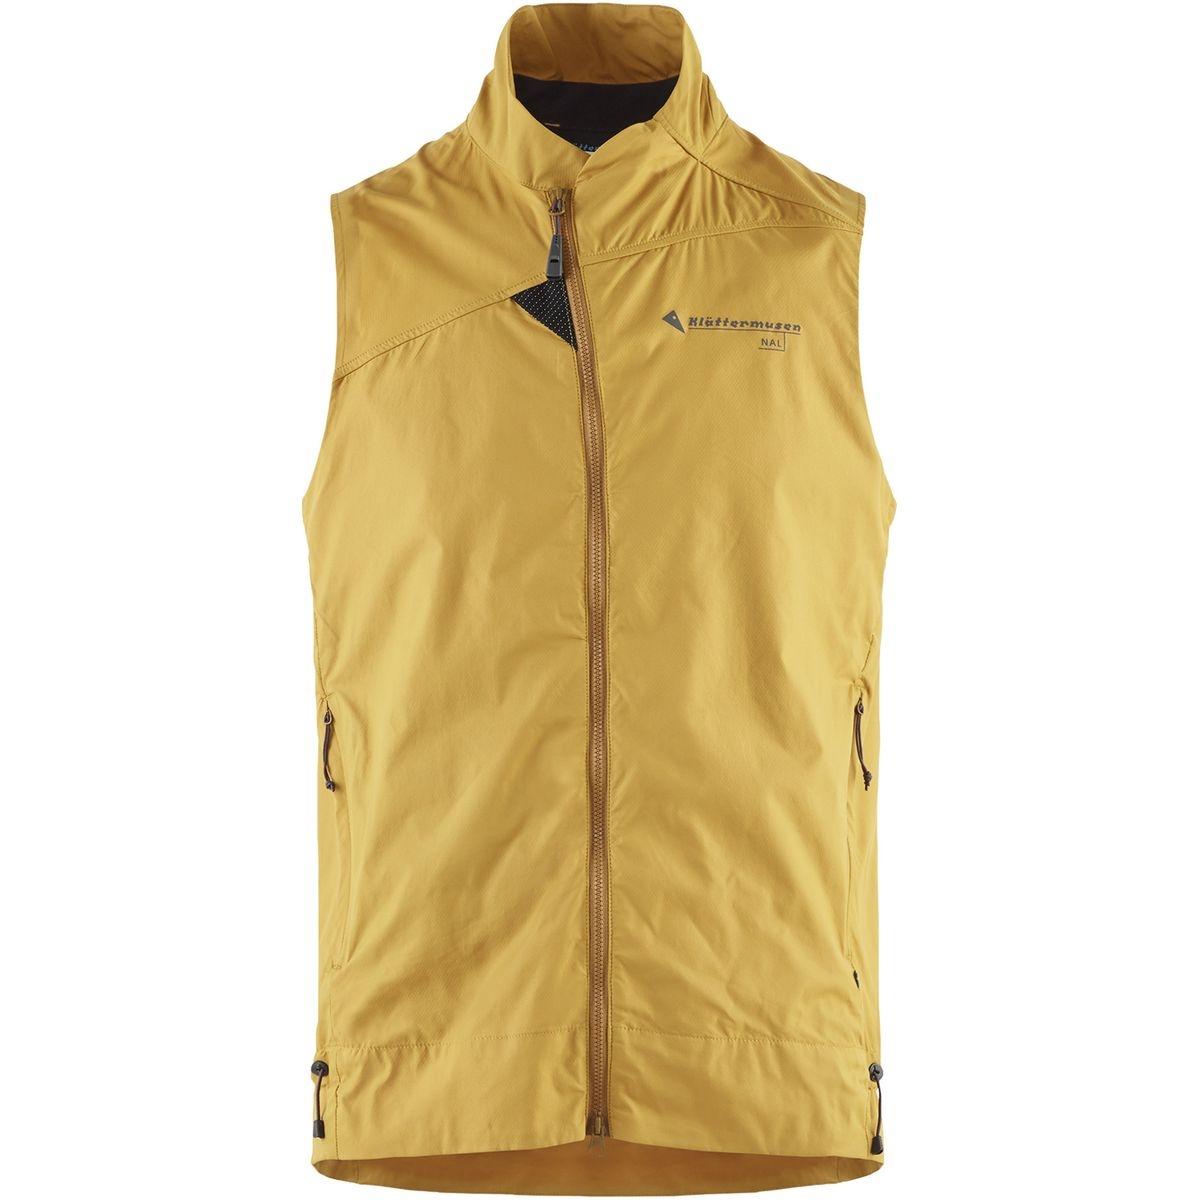 Nal - Veste Homme - jaune